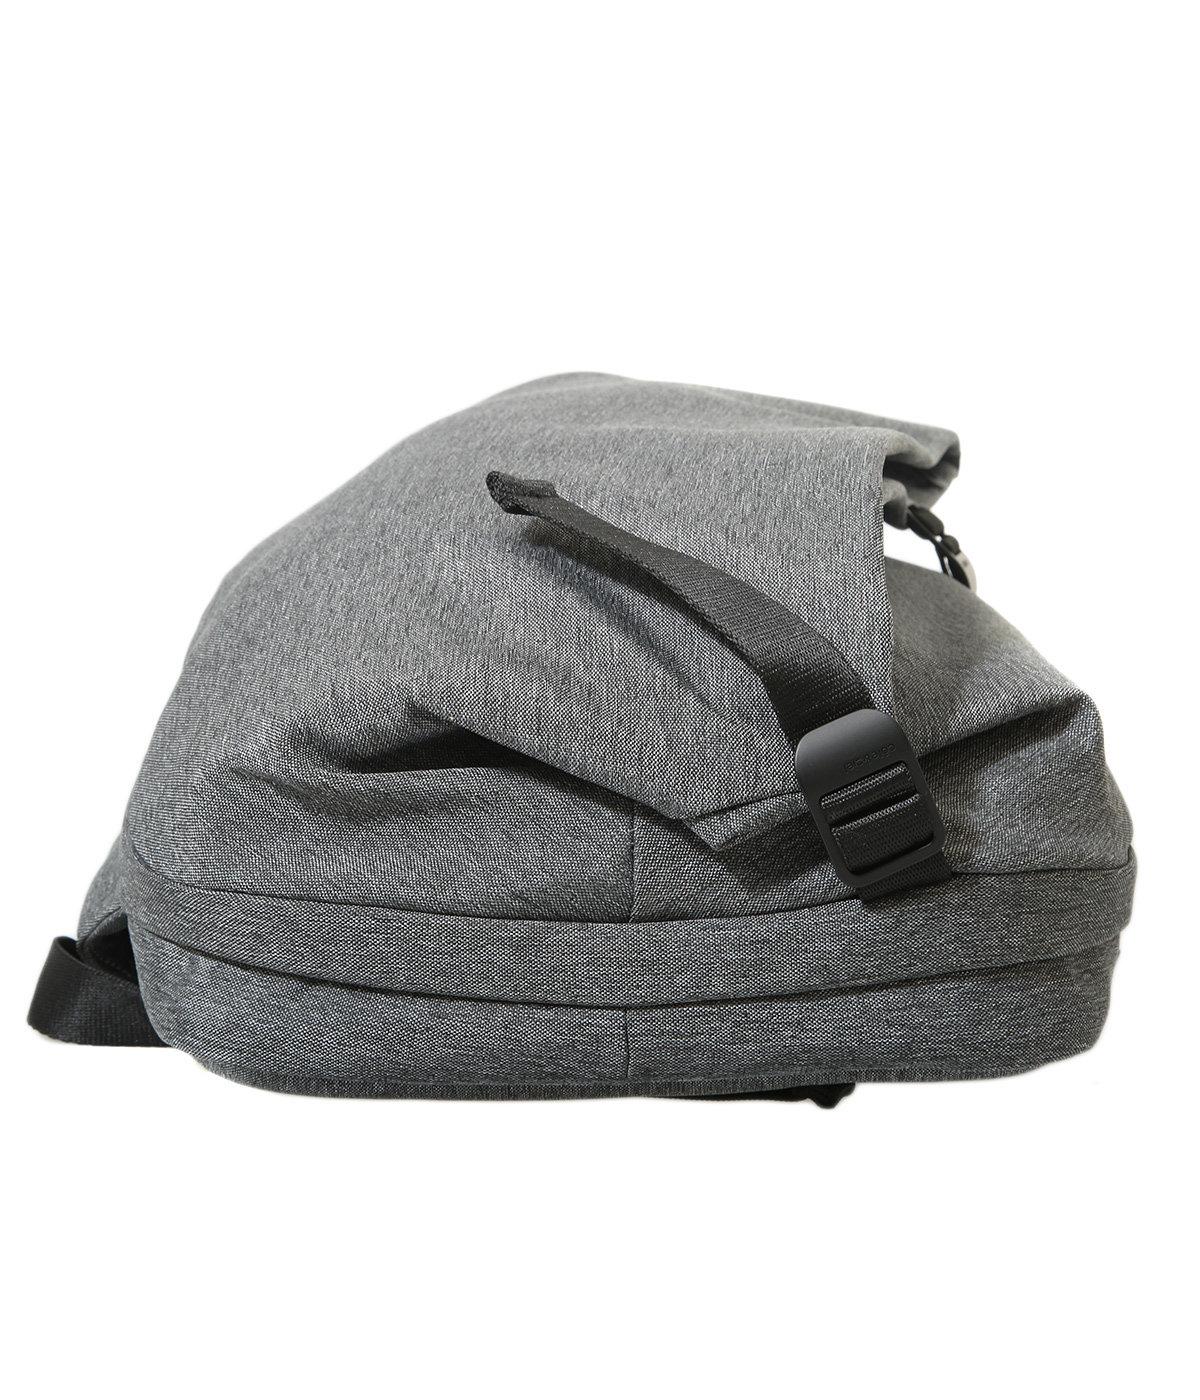 Eco Yarn Isar [Small] (Eco Yarn / BLACK MELANGE / Laptops up to 13inch)